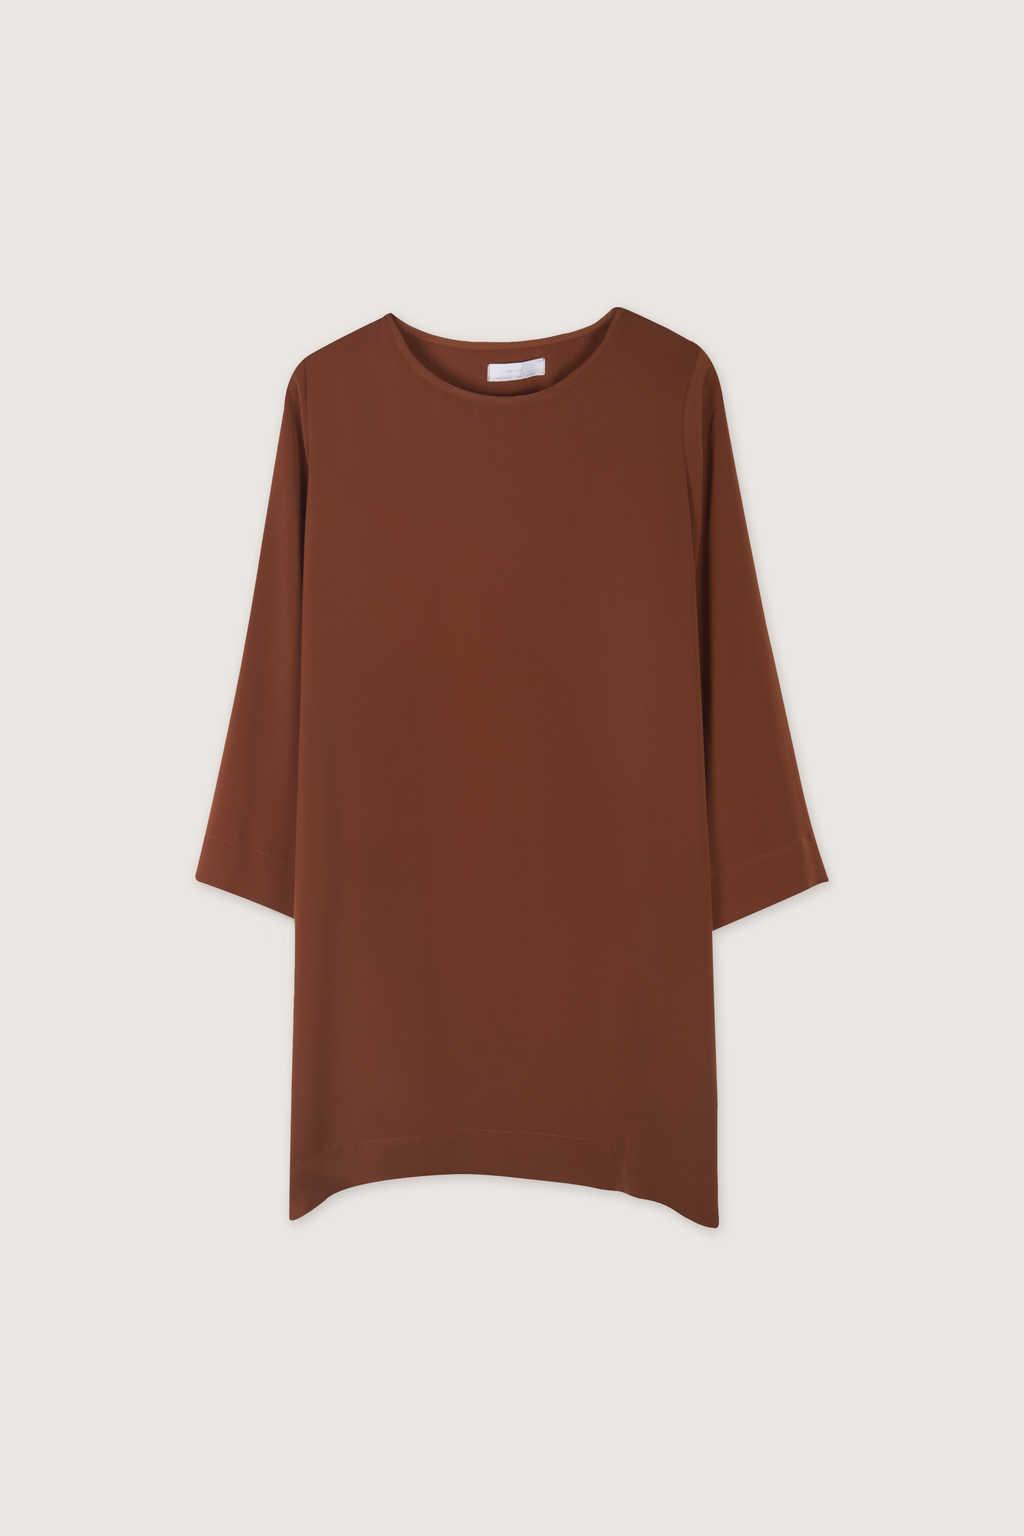 Dress 1670 Clay 11